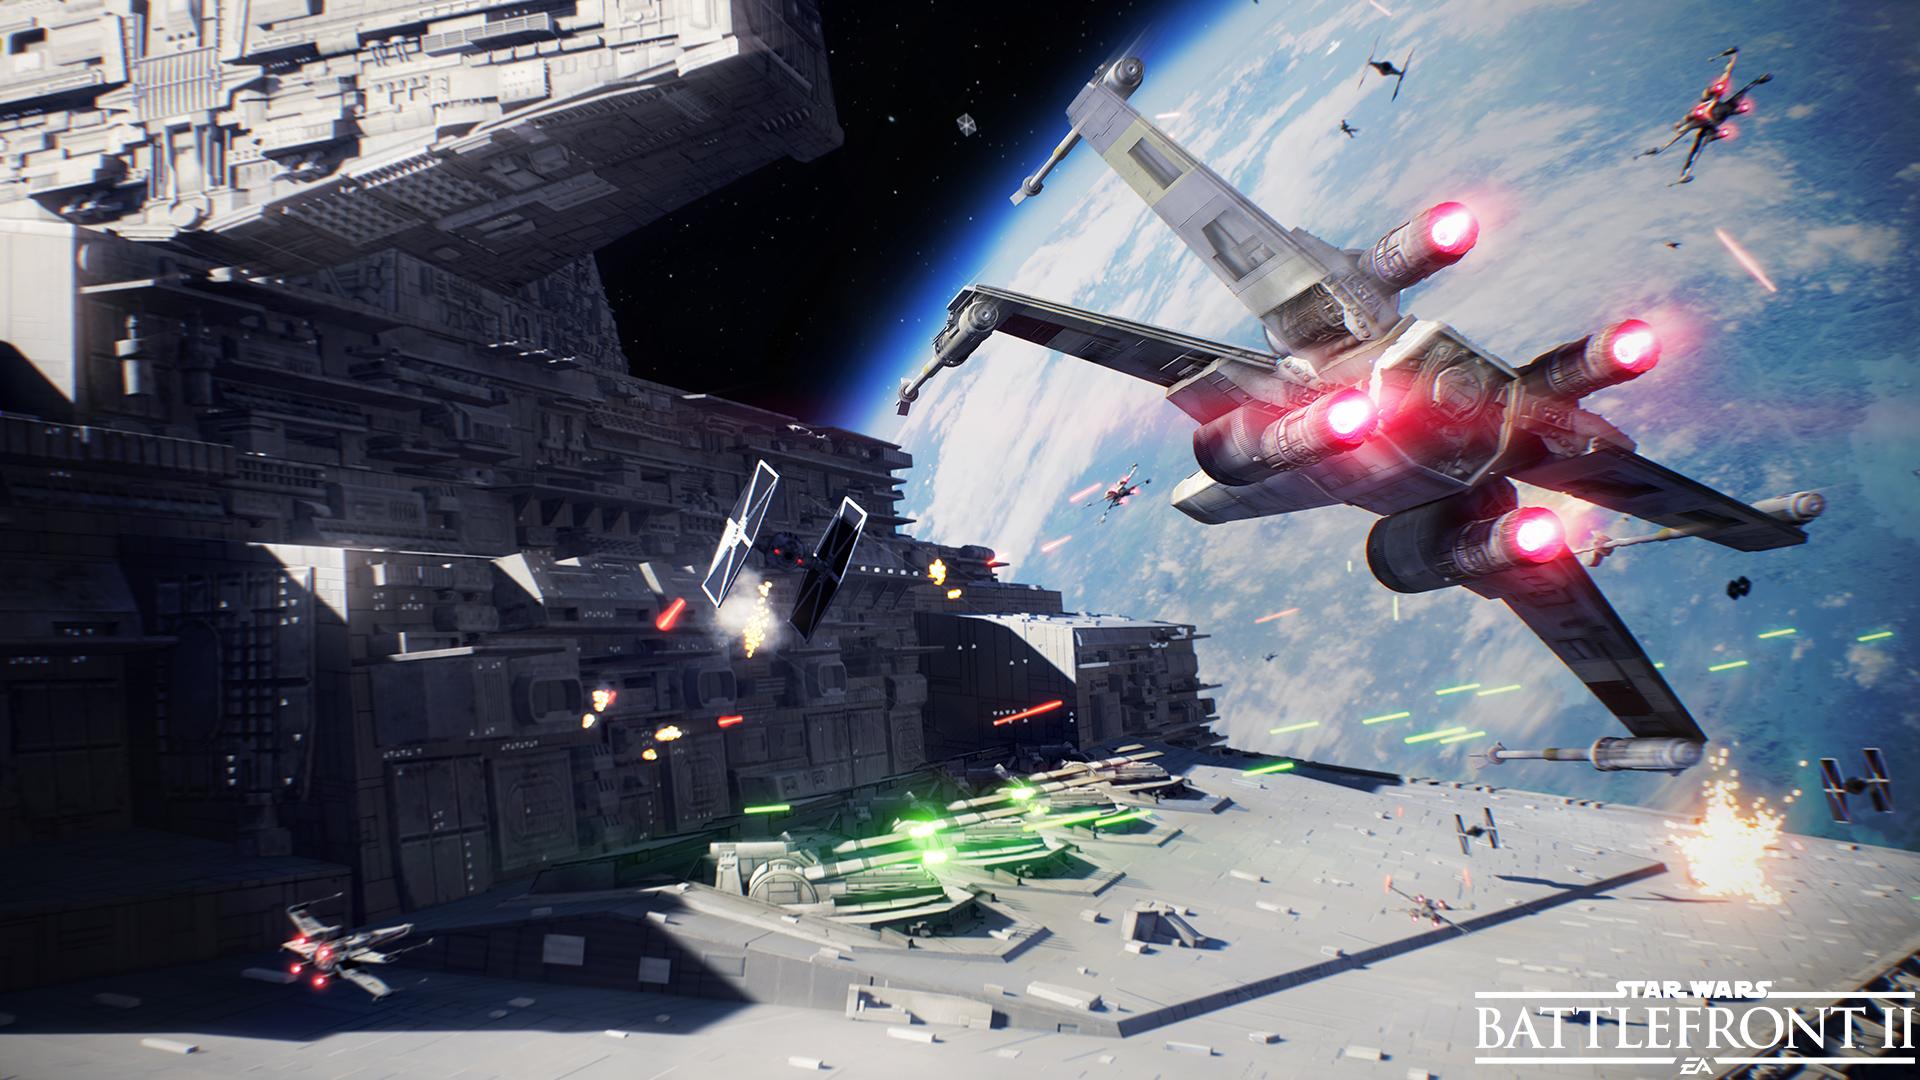 battlefront ii star wars gioco trailer leakato battaglie spaziali